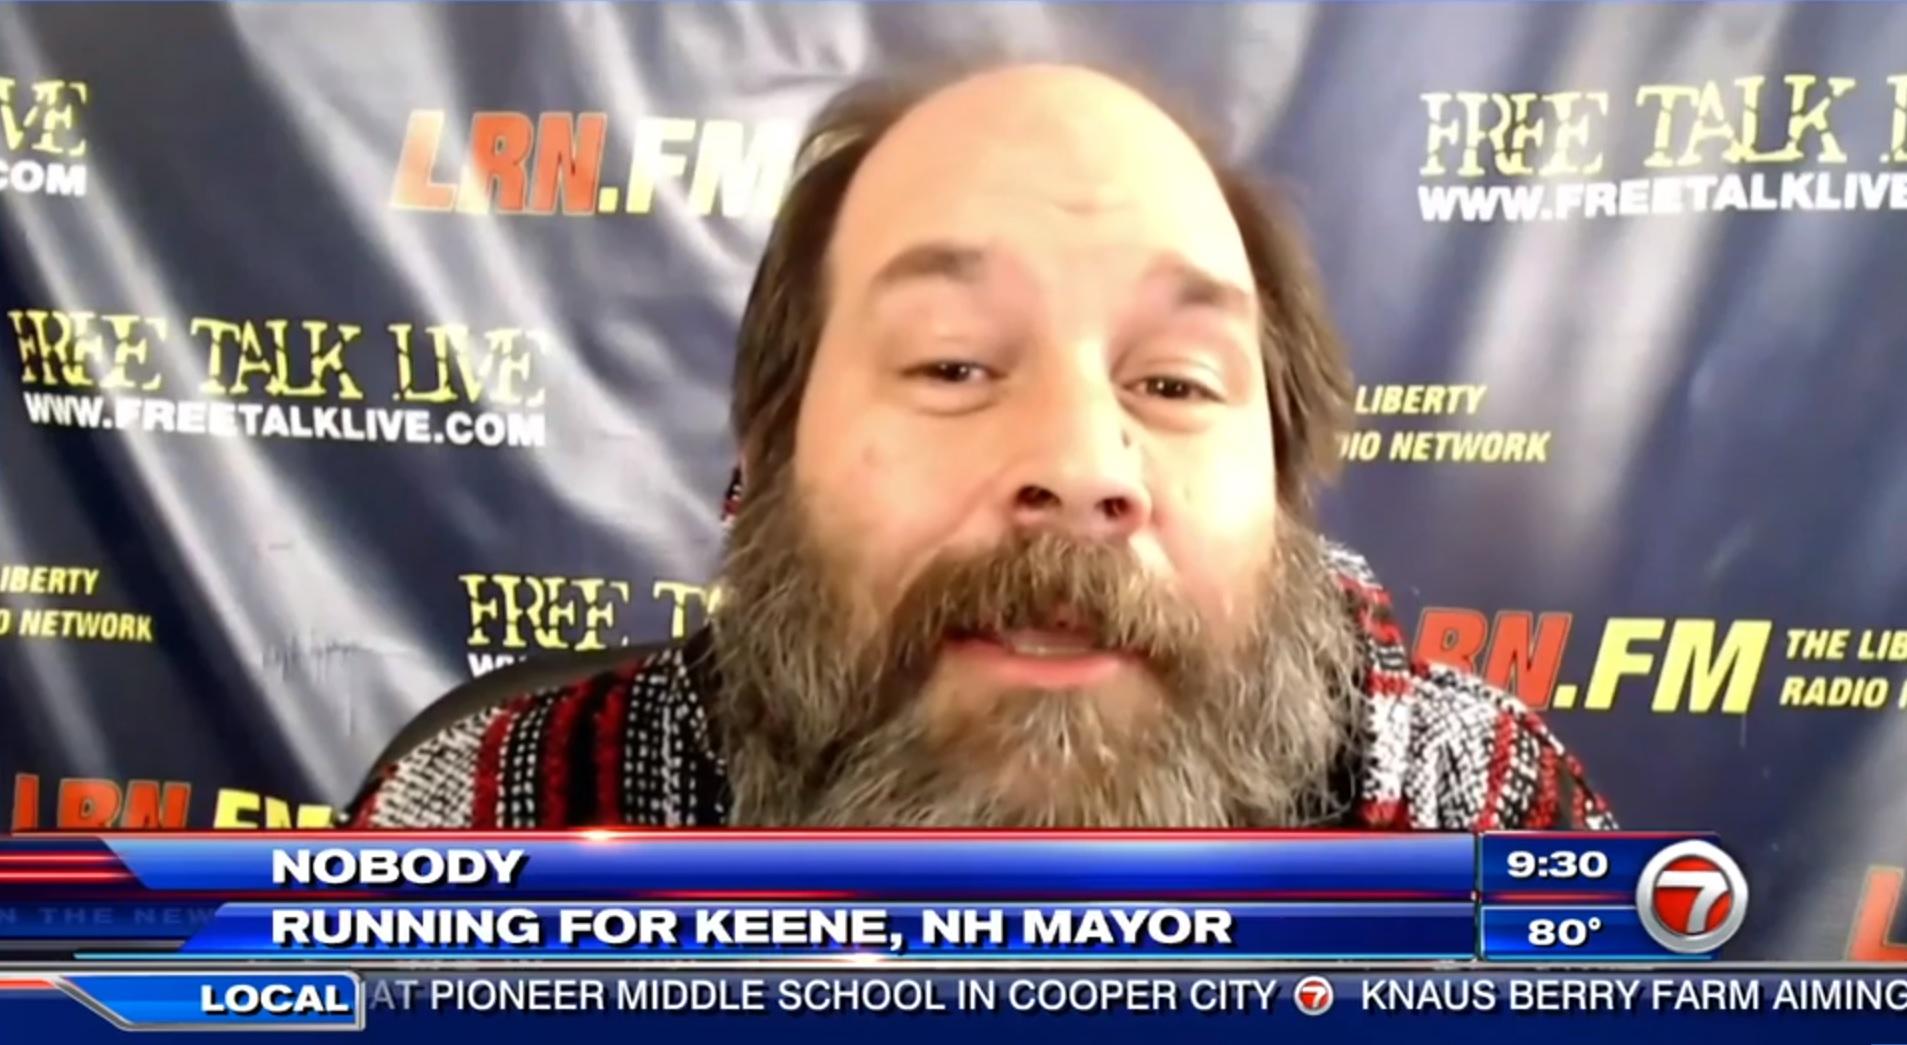 Nobody: Running for Keene, NH Mayor